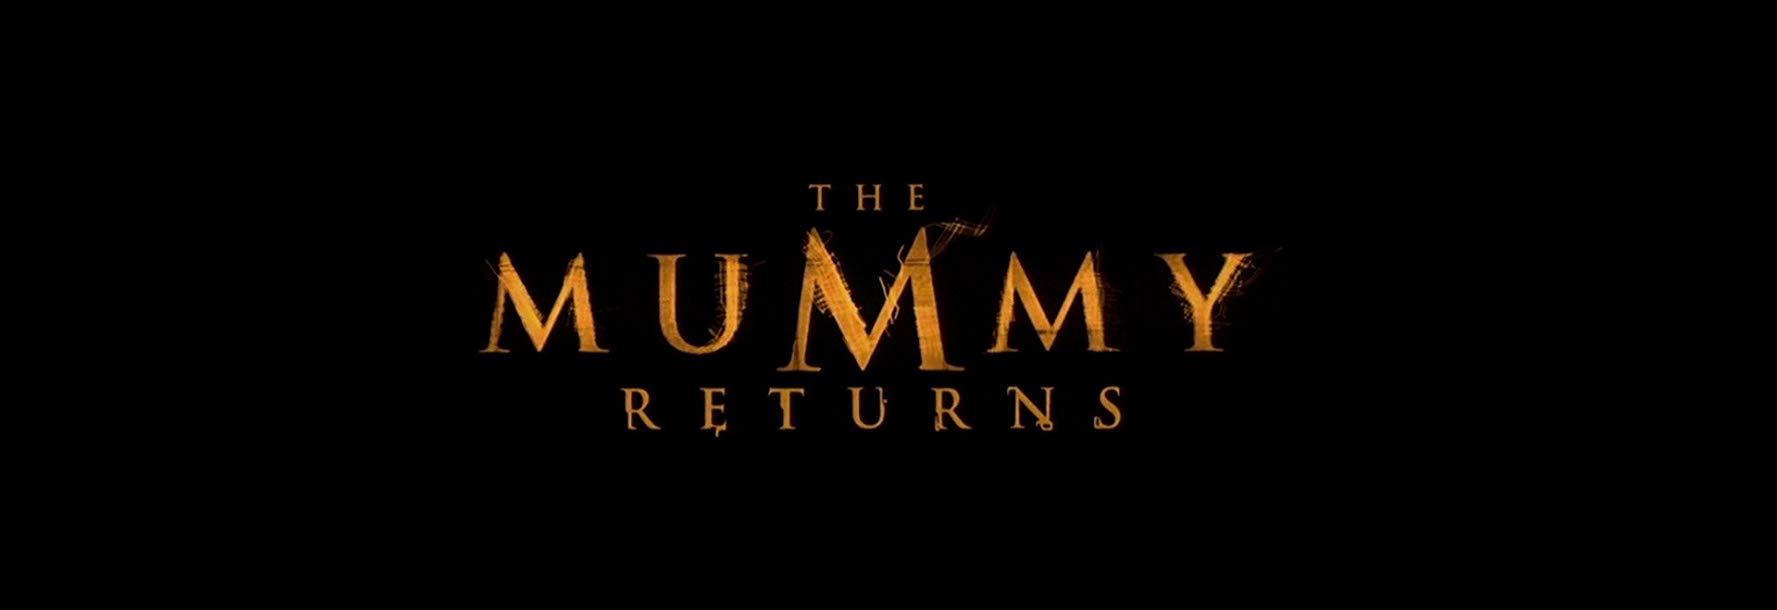 The Mummy Returns (2001).